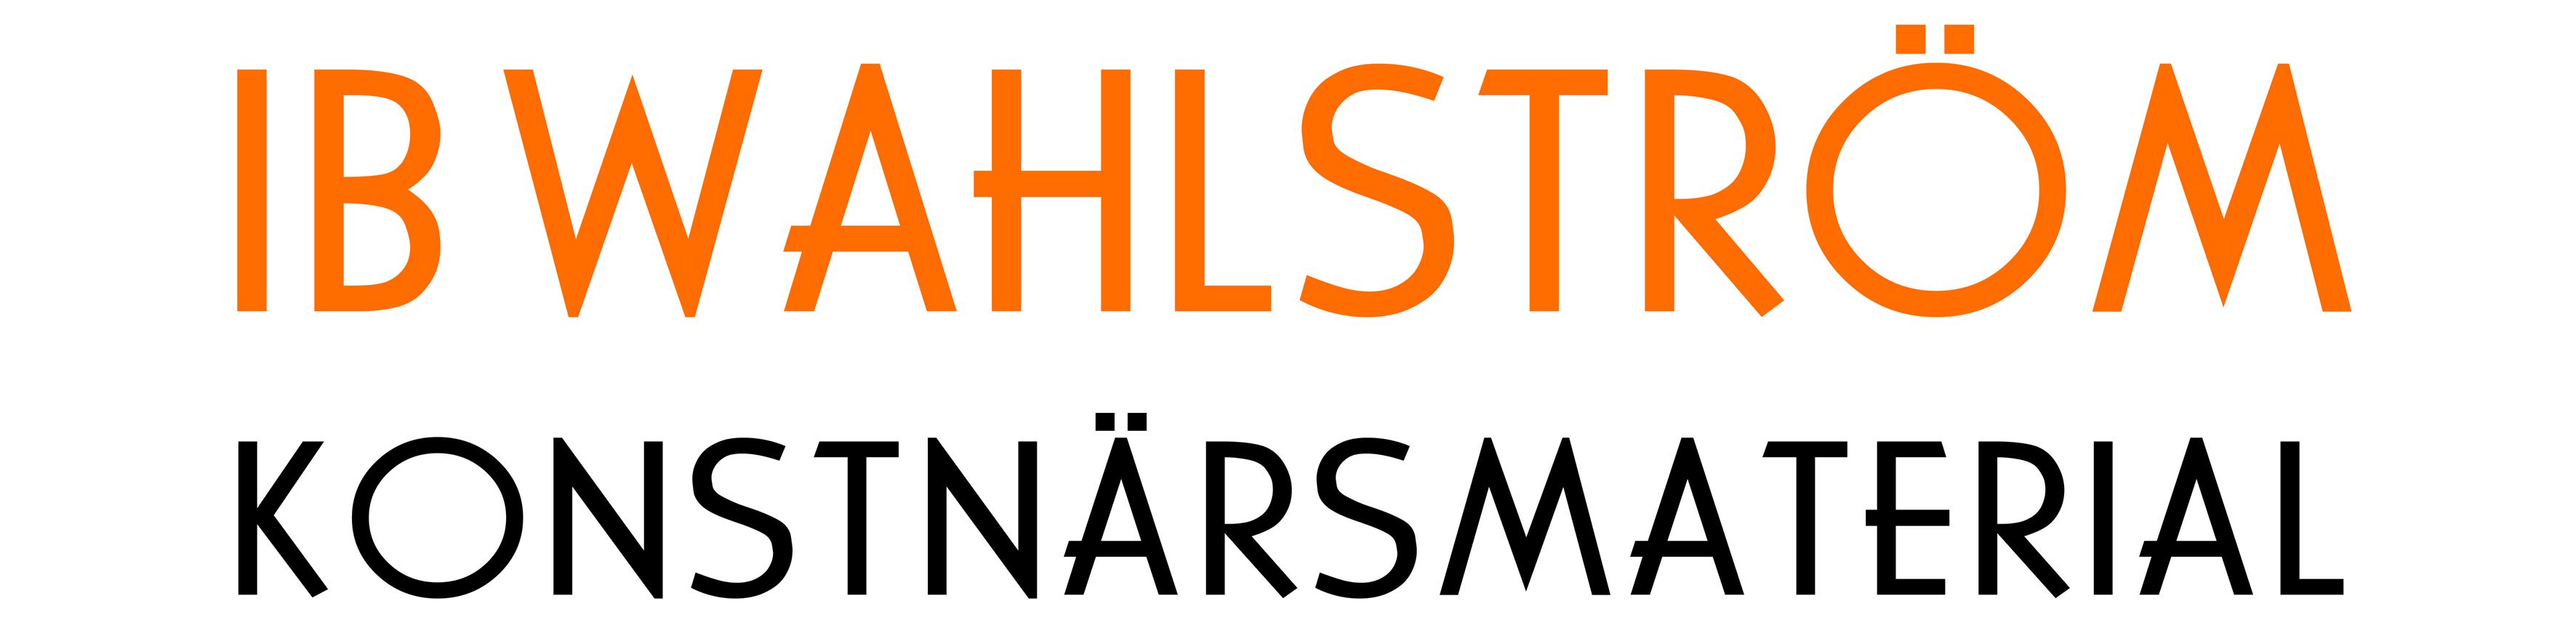 Ib Wahlström konstnärsmaterial